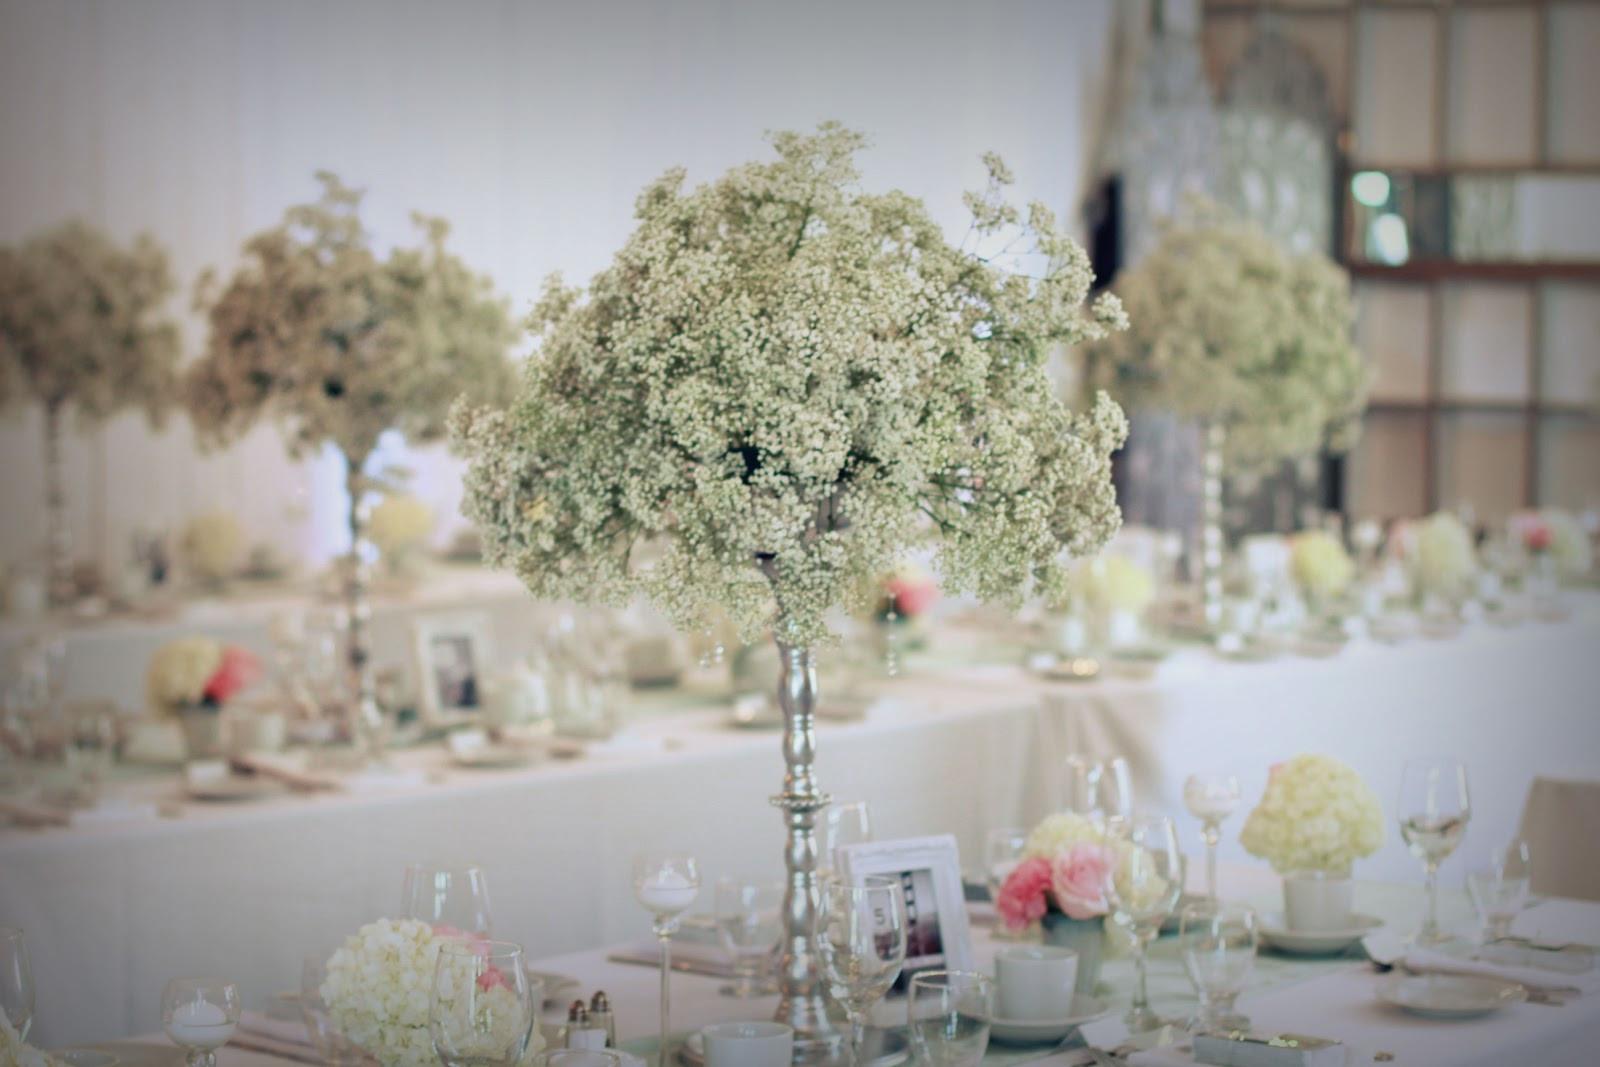 Best ideas about DIY Centerpieces Wedding . Save or Pin DIY Wedding Centerpieces Now.